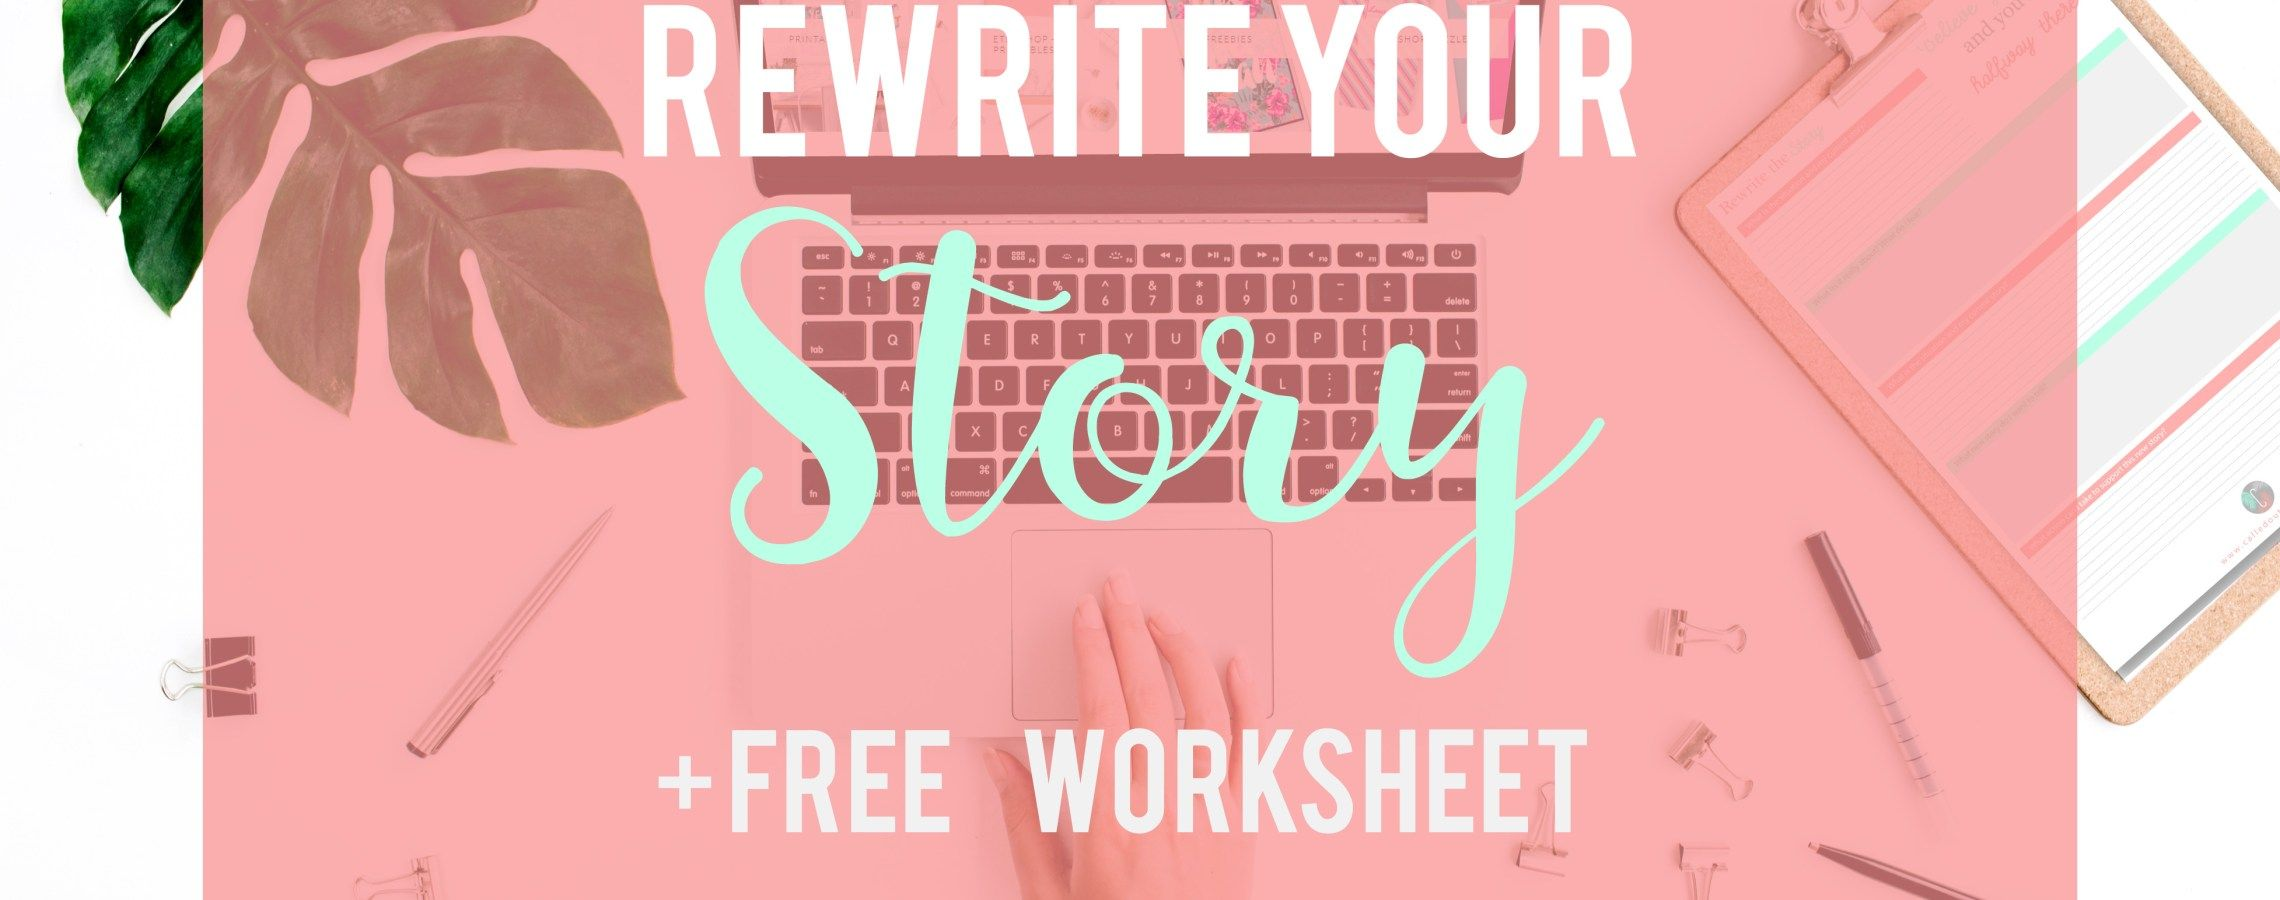 Rewrite Your Story Worksheet Free Printables